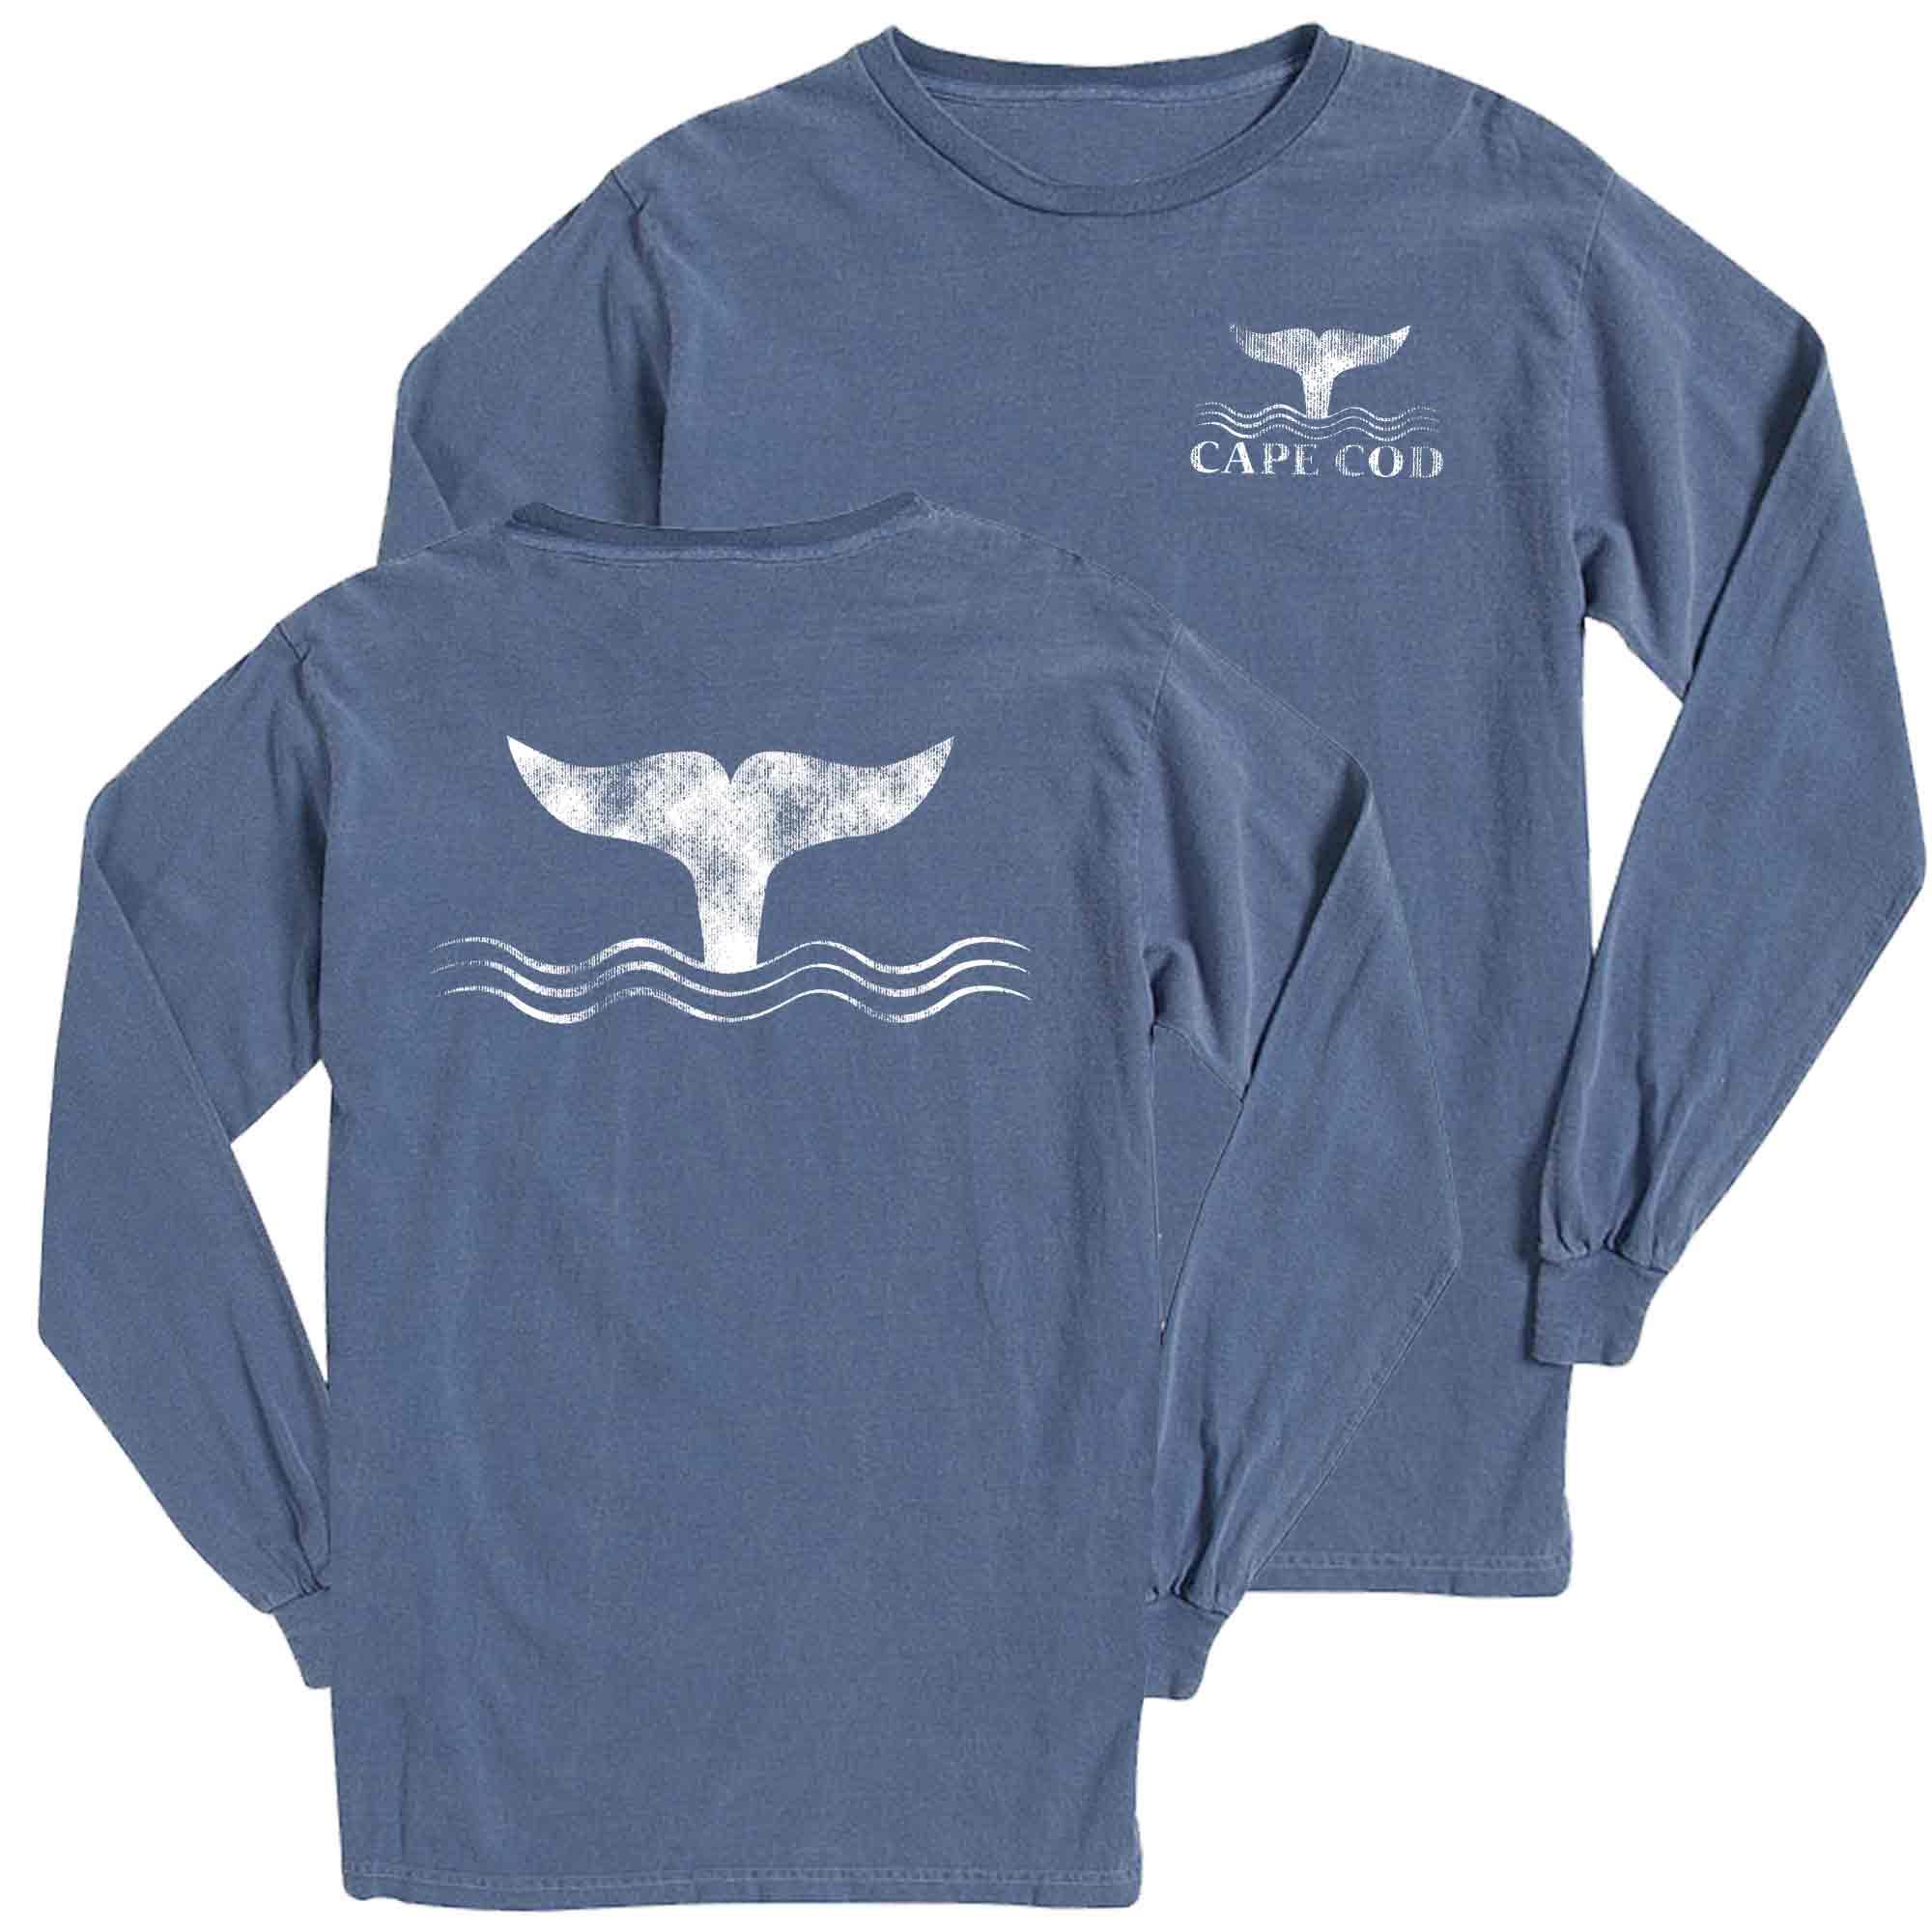 Classic Marthas Vineyard Cape Cod Sweatshirt